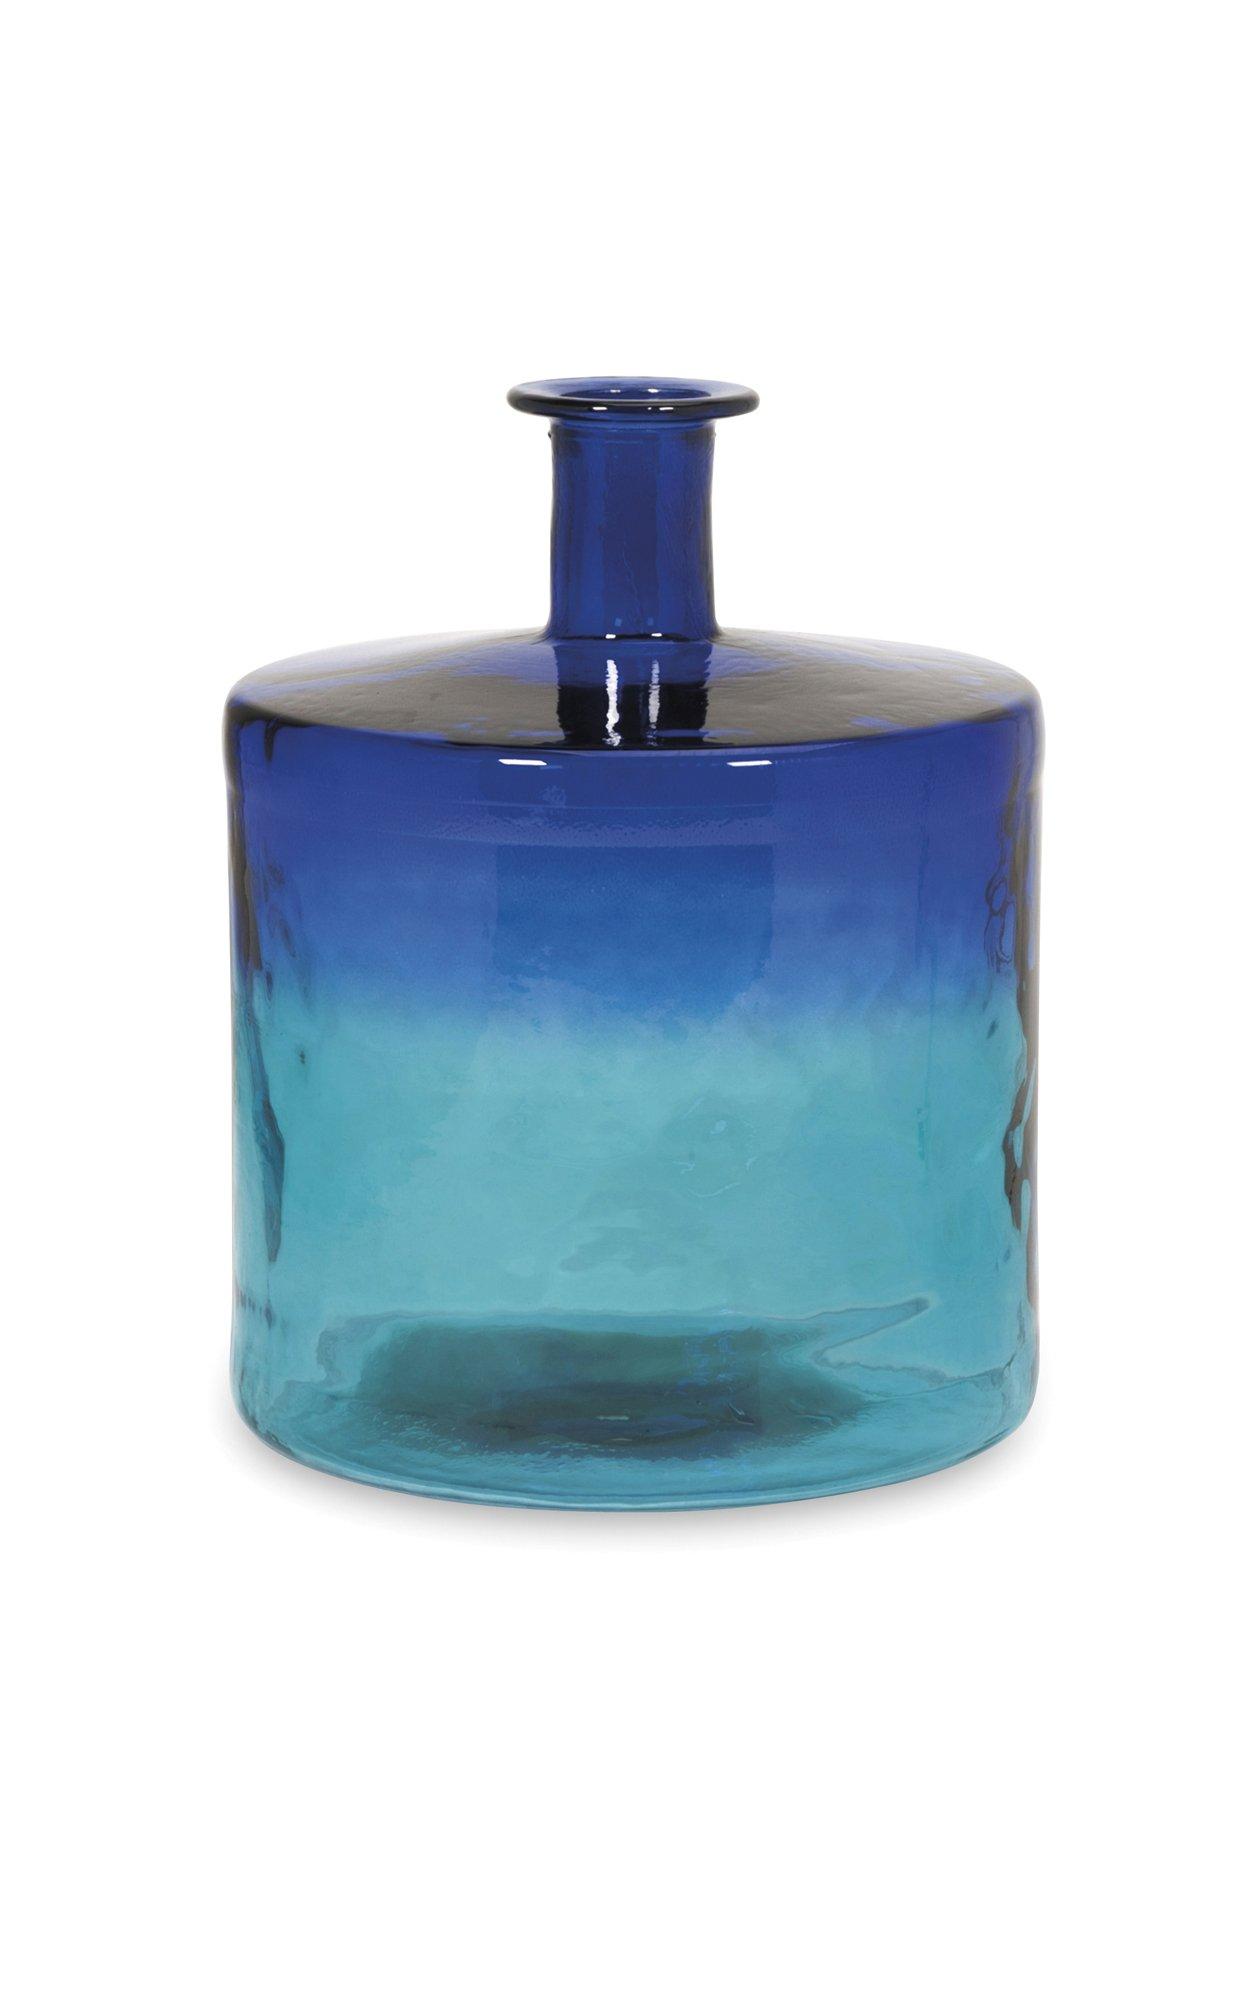 Imax 84526 Luzon Short Oversized Recycled Glass Vase